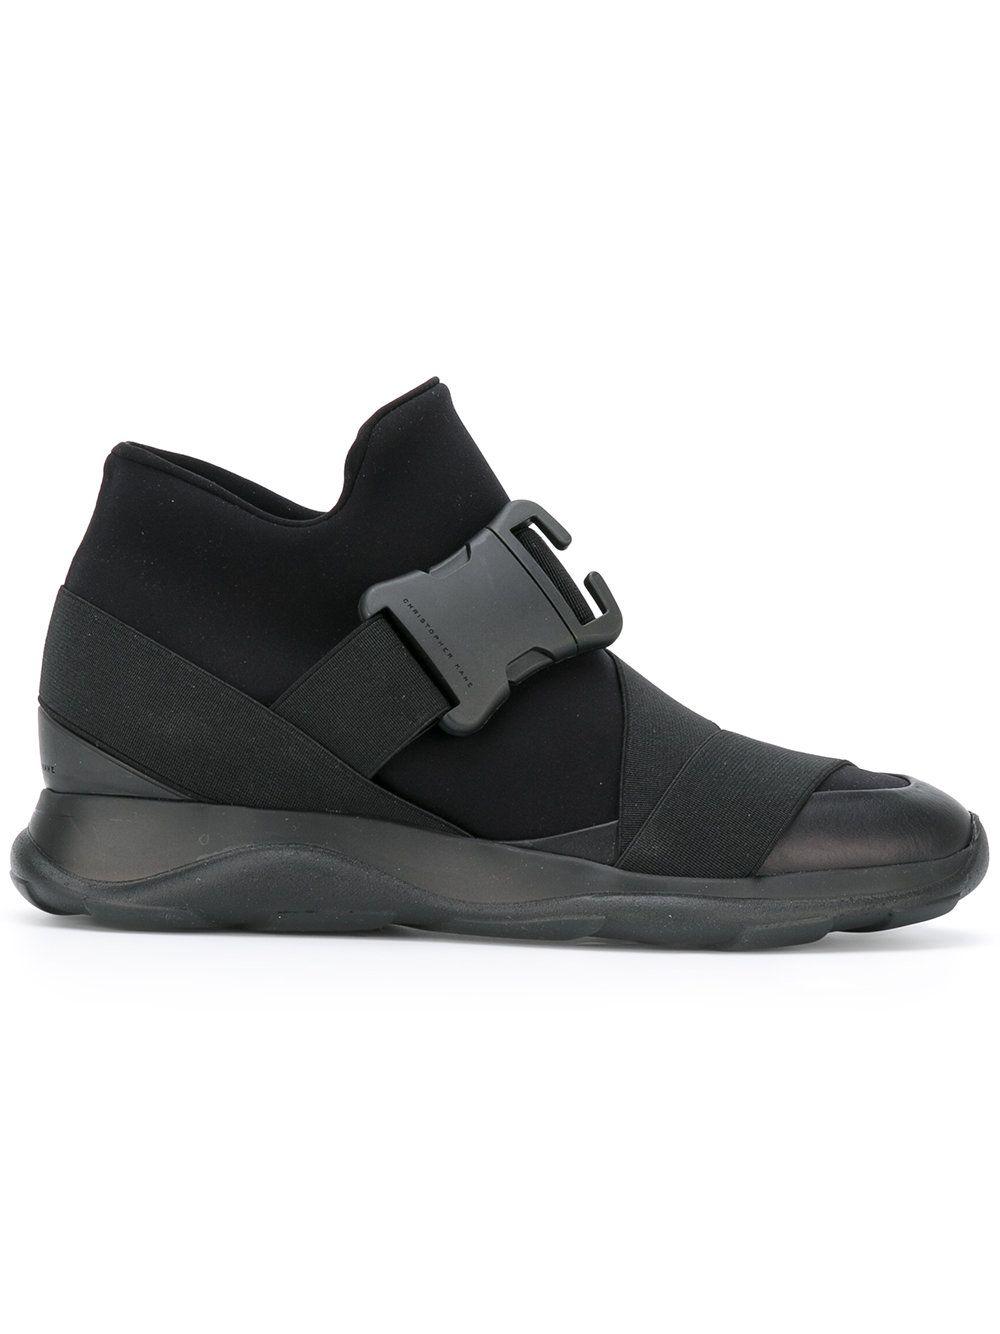 FOOTWEAR - High-tops & sneakers Christopher Kane Supply For Sale okyBO